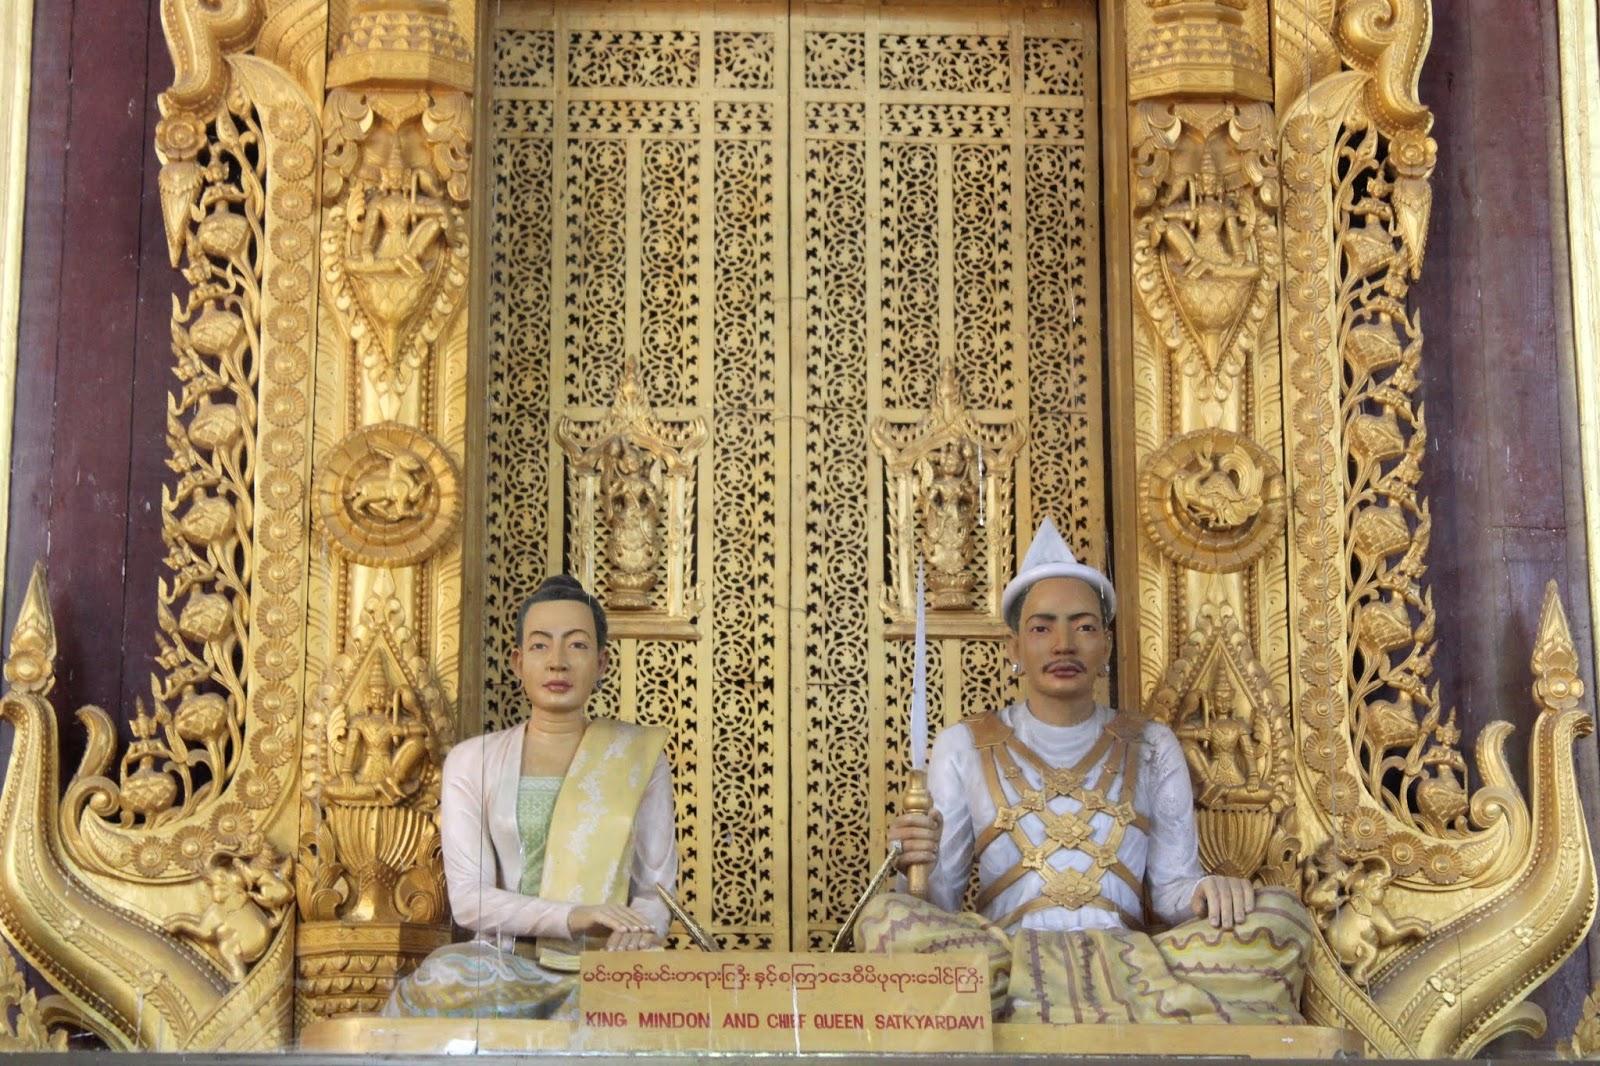 palazzo reale mandalay myanmar